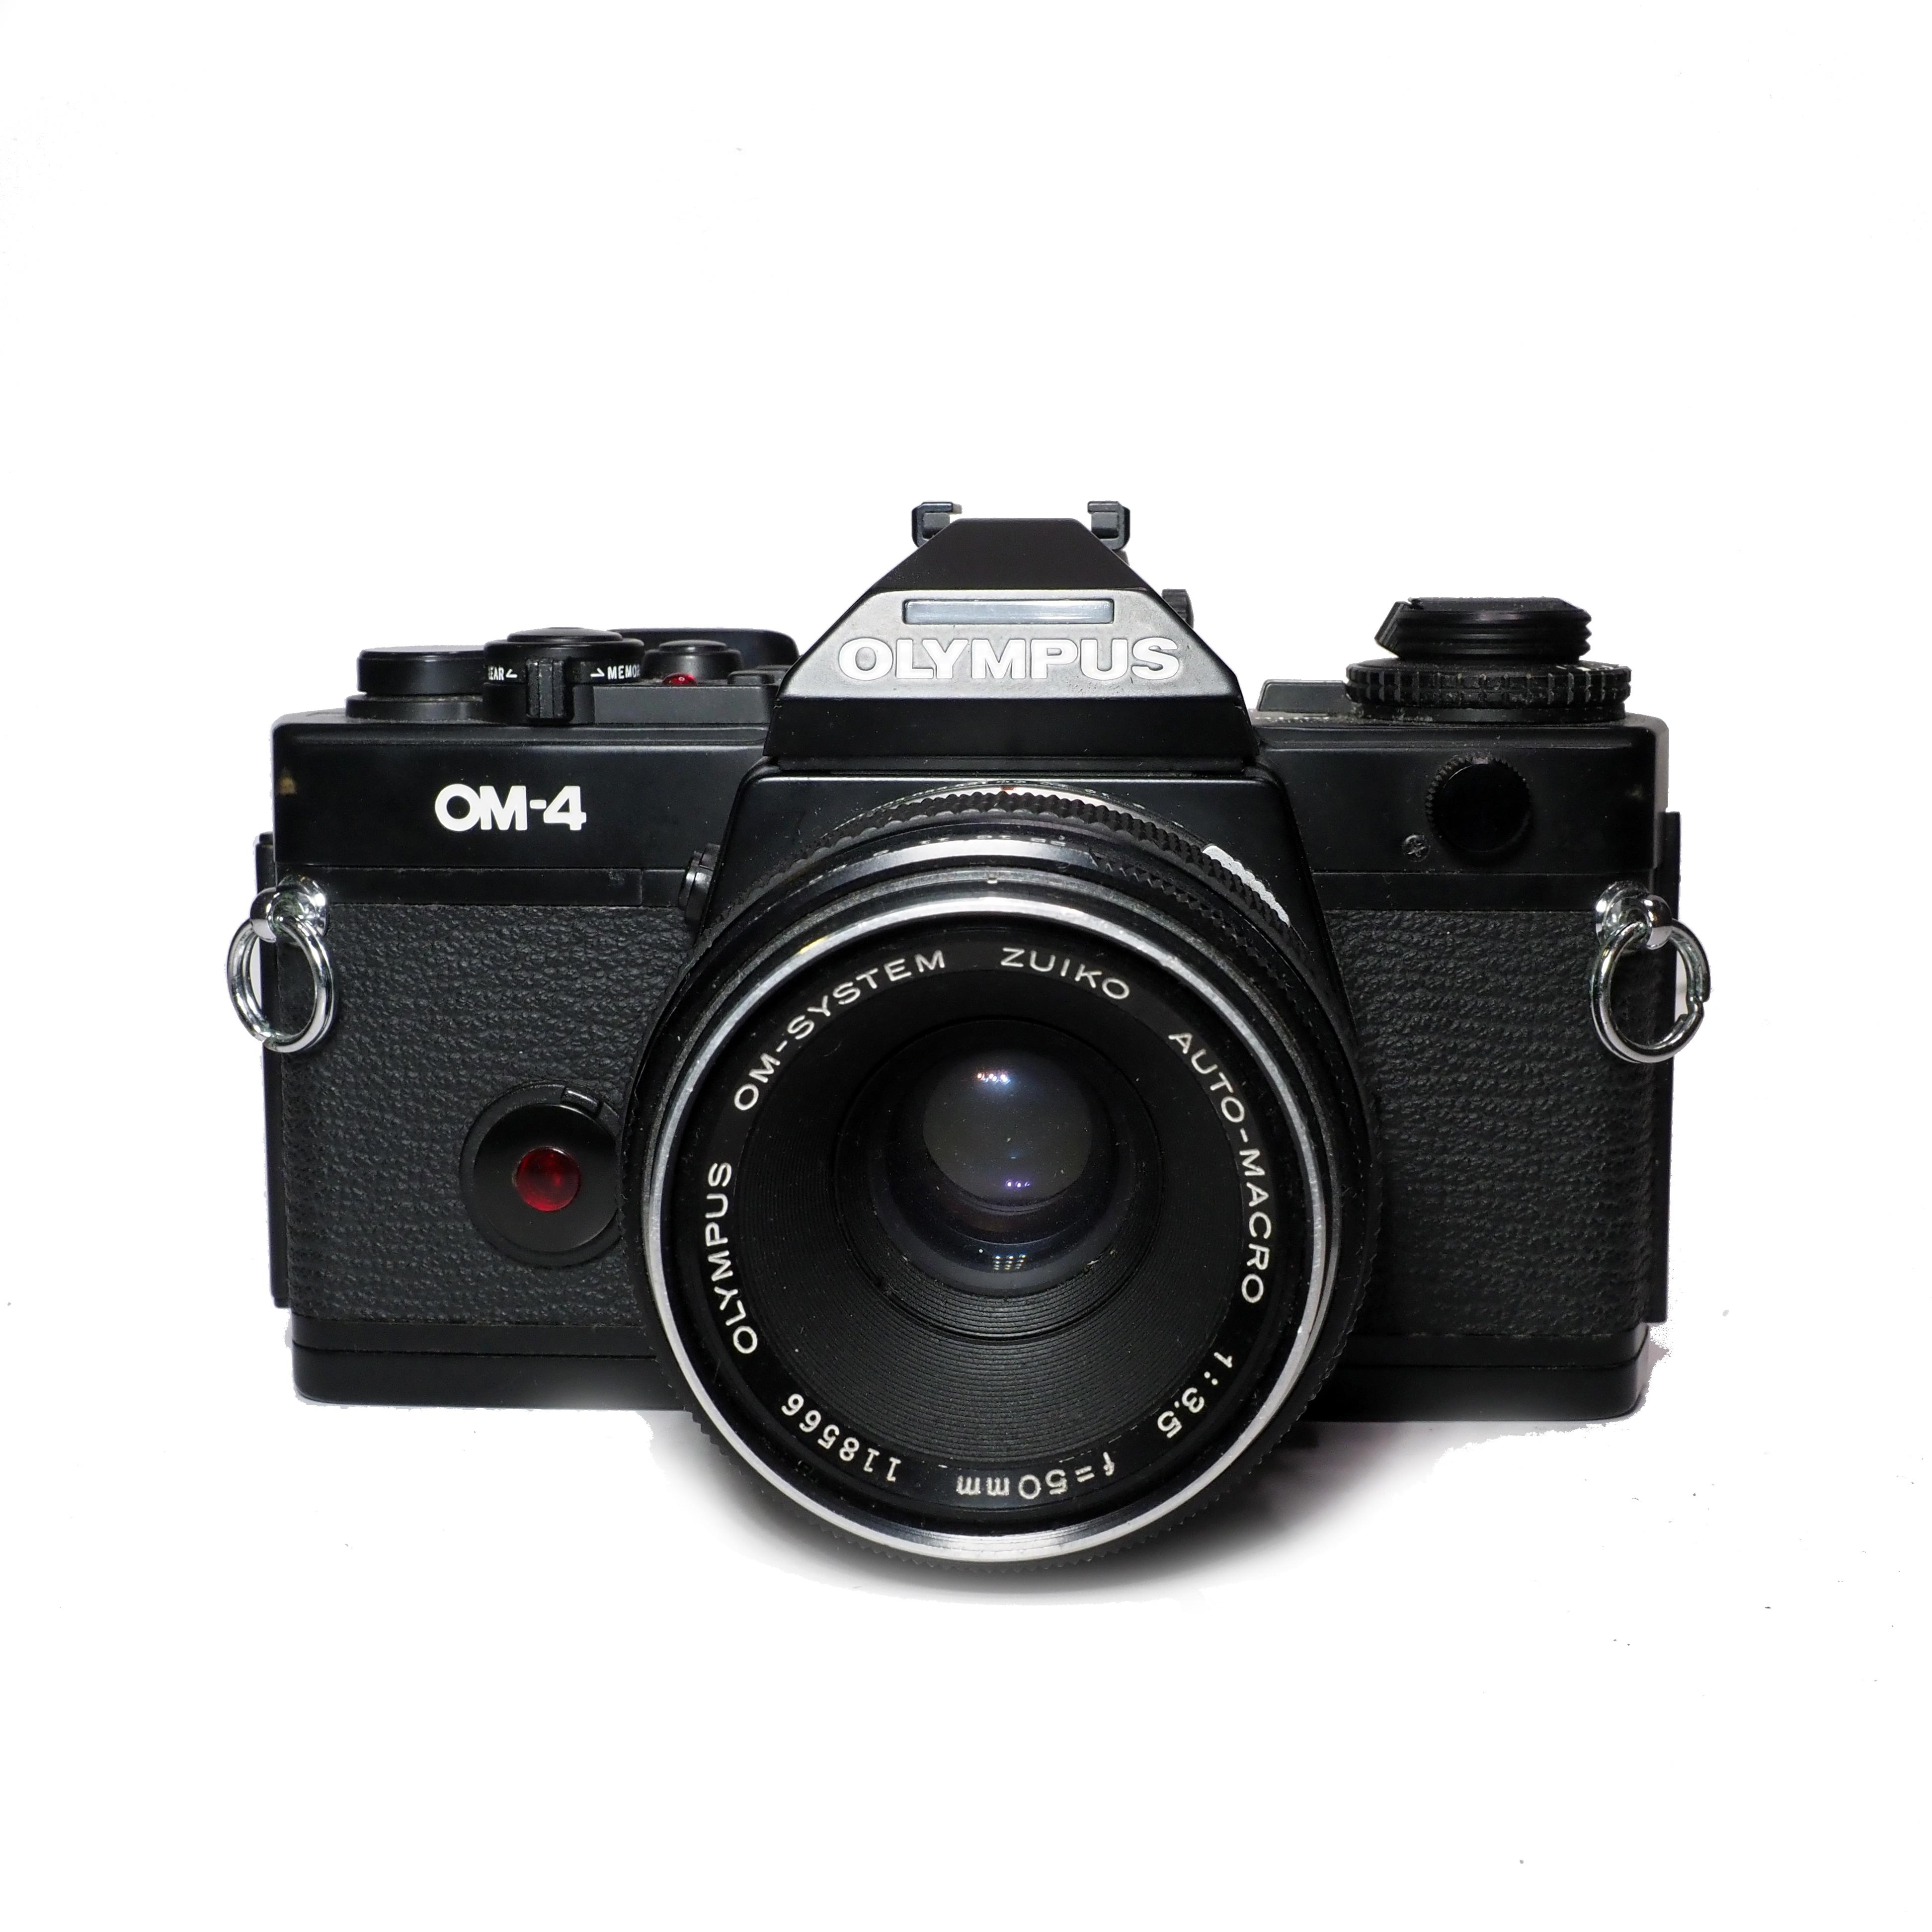 Olympus OM-4 inkl. Macro 50mm f/3,5 - BEGAGNAT